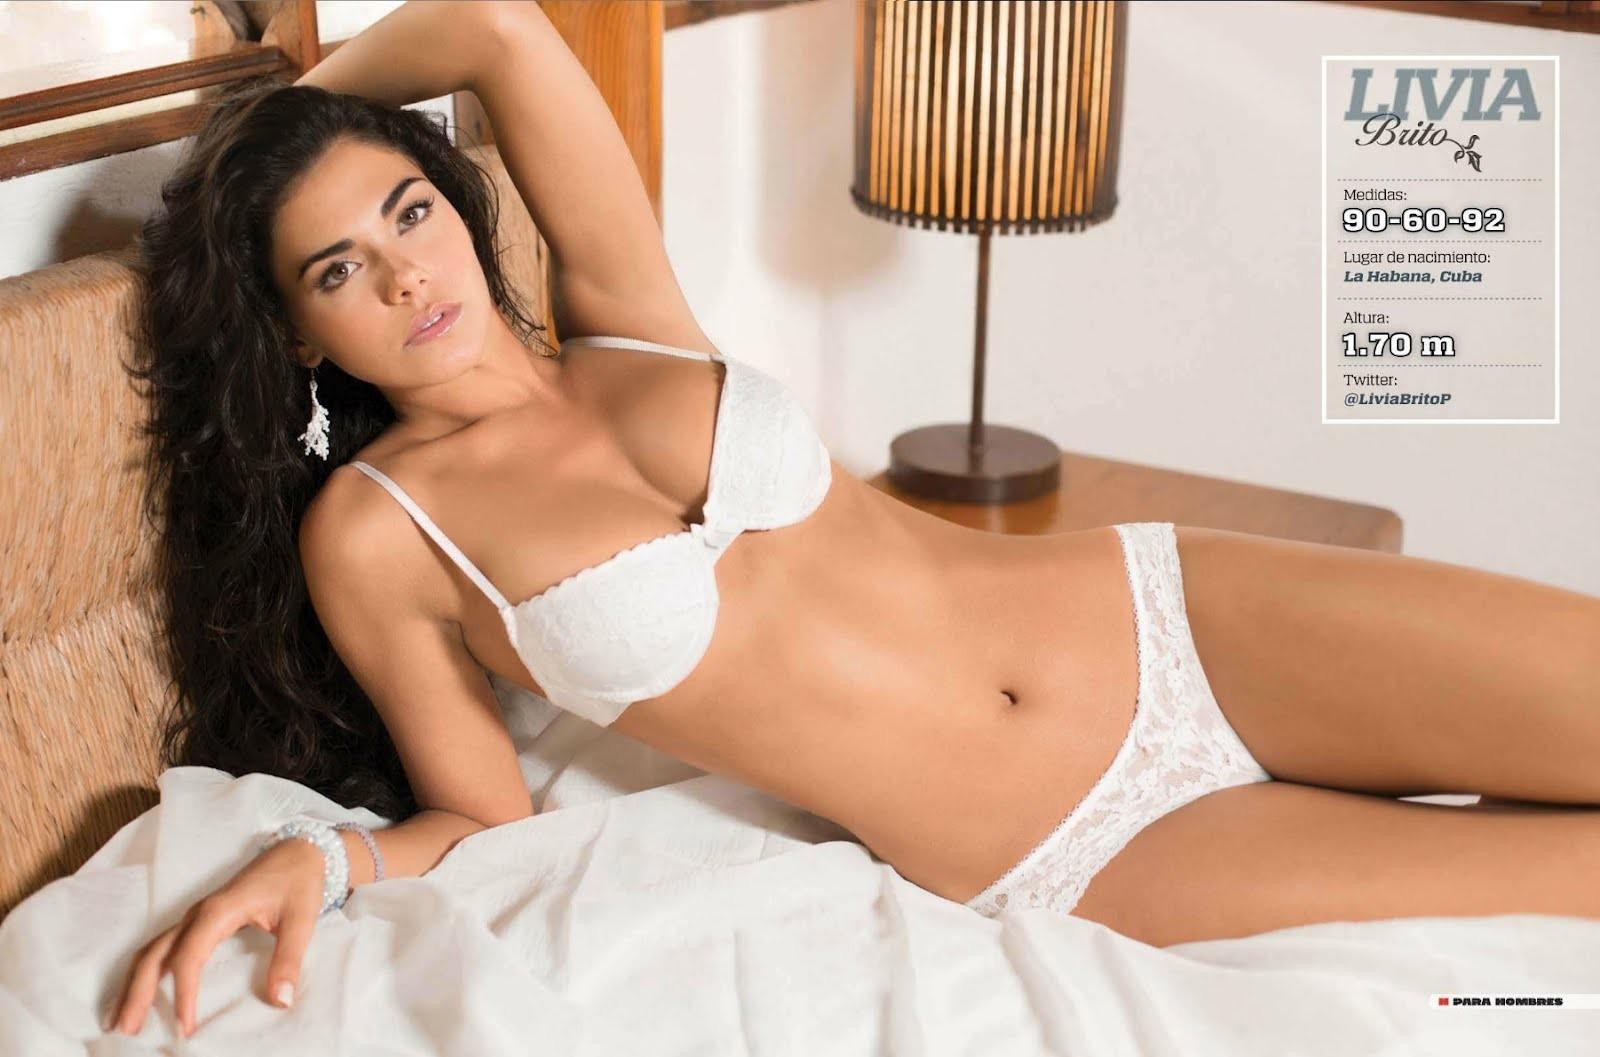 90 60 90 Follando livia brito nude naked pics and videos imperiodefamosas